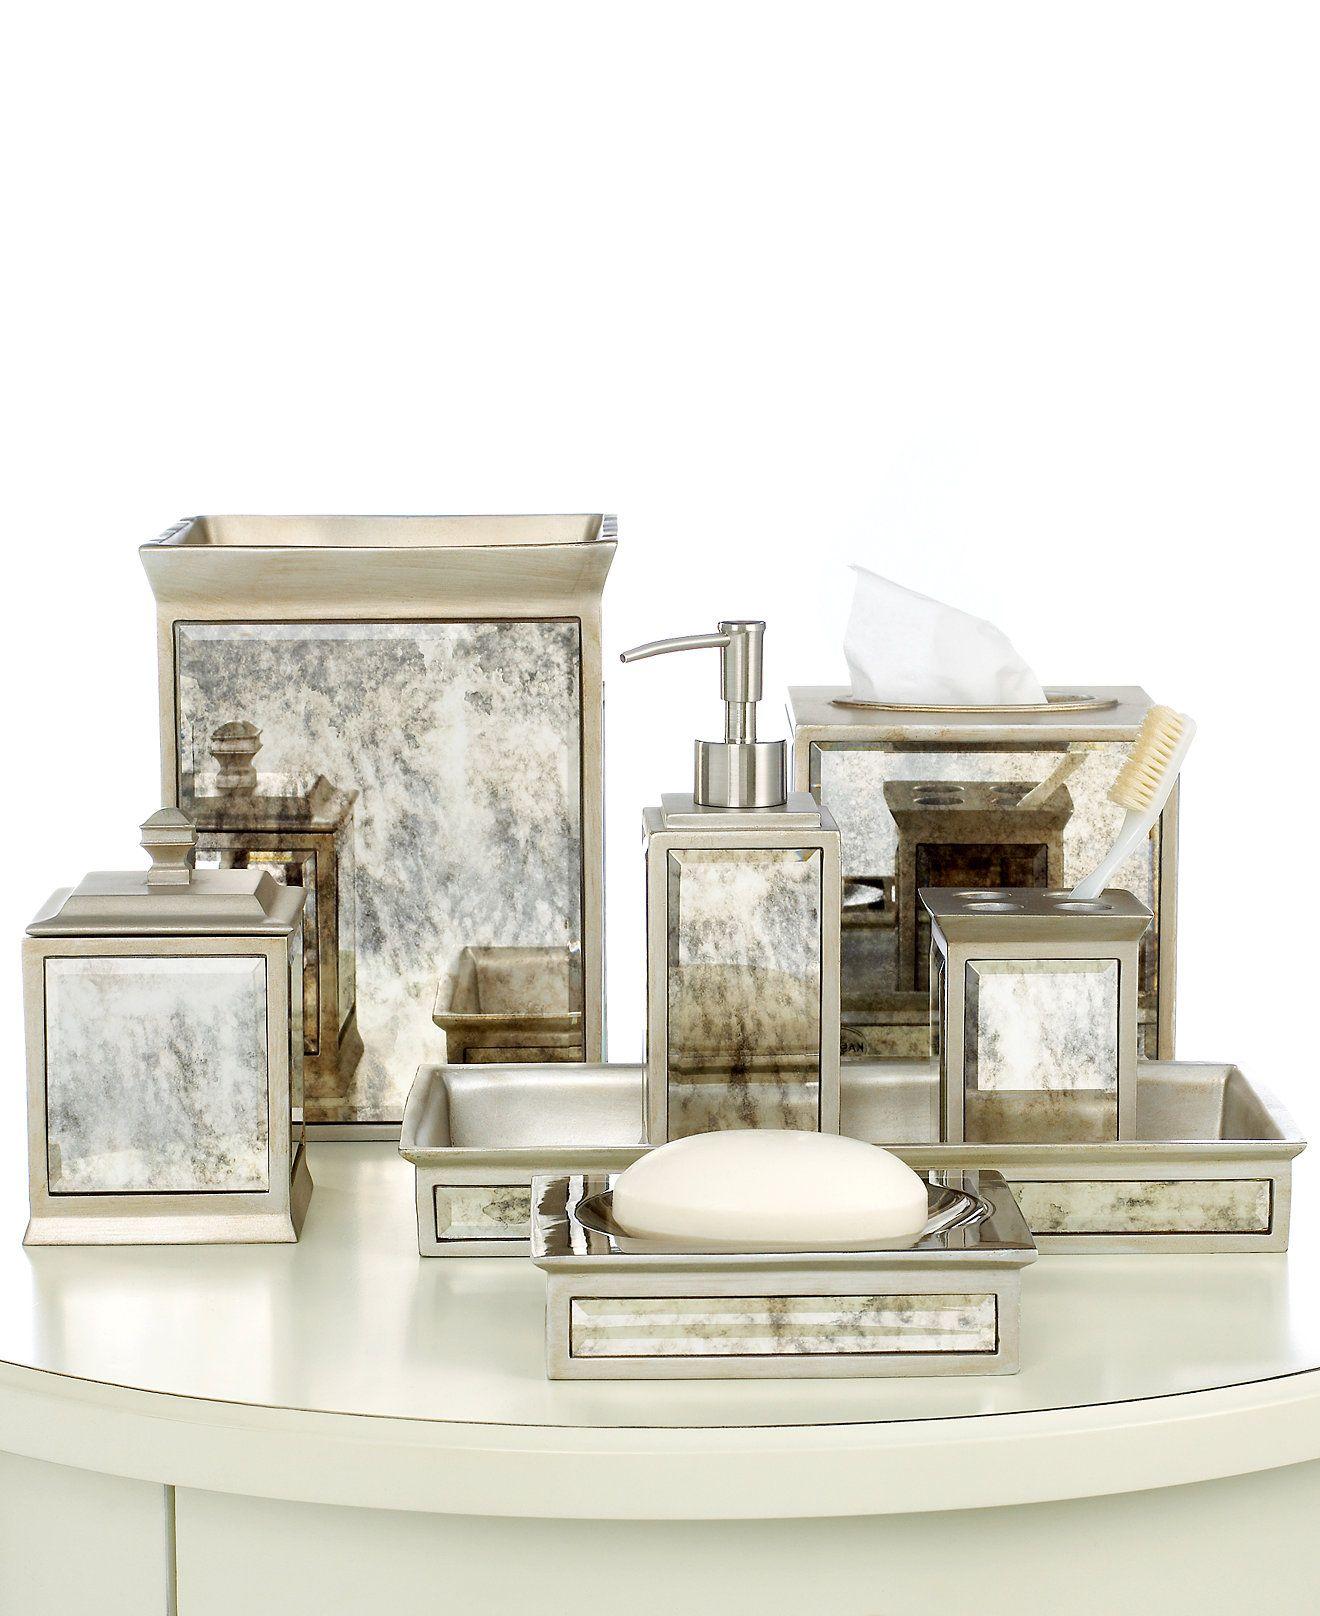 Kassatex Bath Accessories, Palazzo Collection | Bath accessories ...